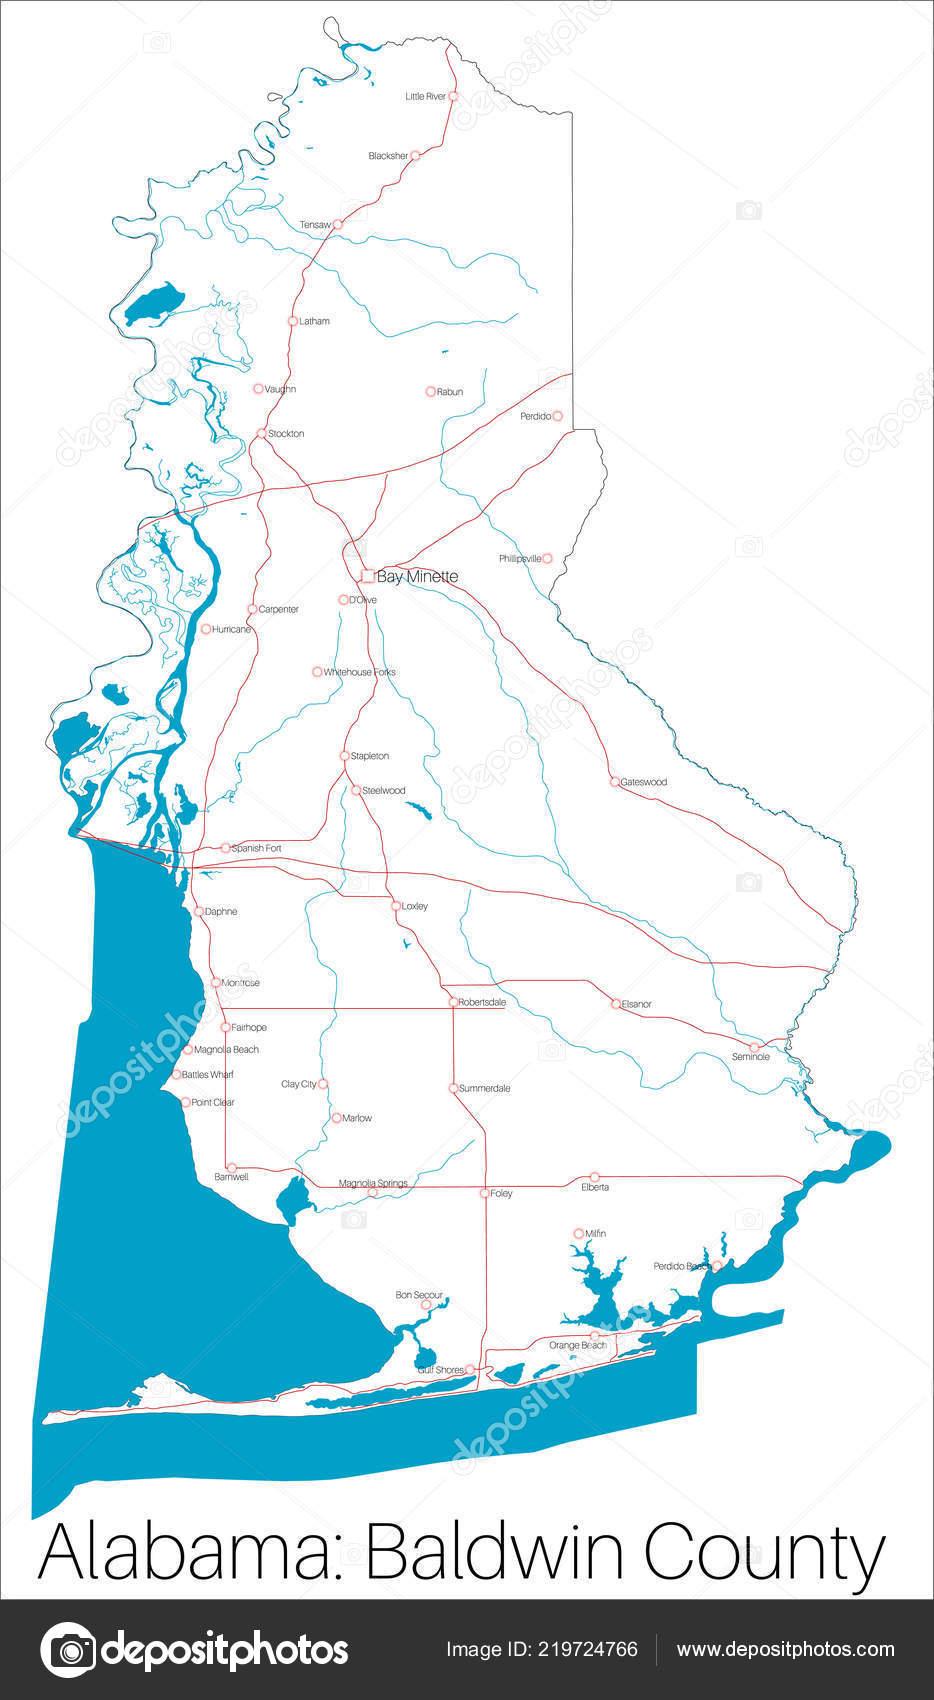 Detailed Map Baldwin County Alabama Usa — Stock Vector ... on dekalb county, baker county alabama map, madison county, nashville alabama map, houston county, pine grove alabama map, jefferson county, daphne alabama map, macon alabama map, autauga county alabama map, city of cullman alabama map, morgan county, spanish fort, gulf shores, escambia county, north alabama county map, orange beach, gulf shores alabama map, monroe county, black warrior river alabama map, montgomery county, barbour county alabama map, washington county, calhoun county, mobile county, st. augustine alabama map, baldwin beach express map, shelby county, silverhill alabama map, cook county alabama map, stockton alabama map, walton county alabama map, gulf state park alabama map, south carolina alabama map, perdido alabama map, butler county,